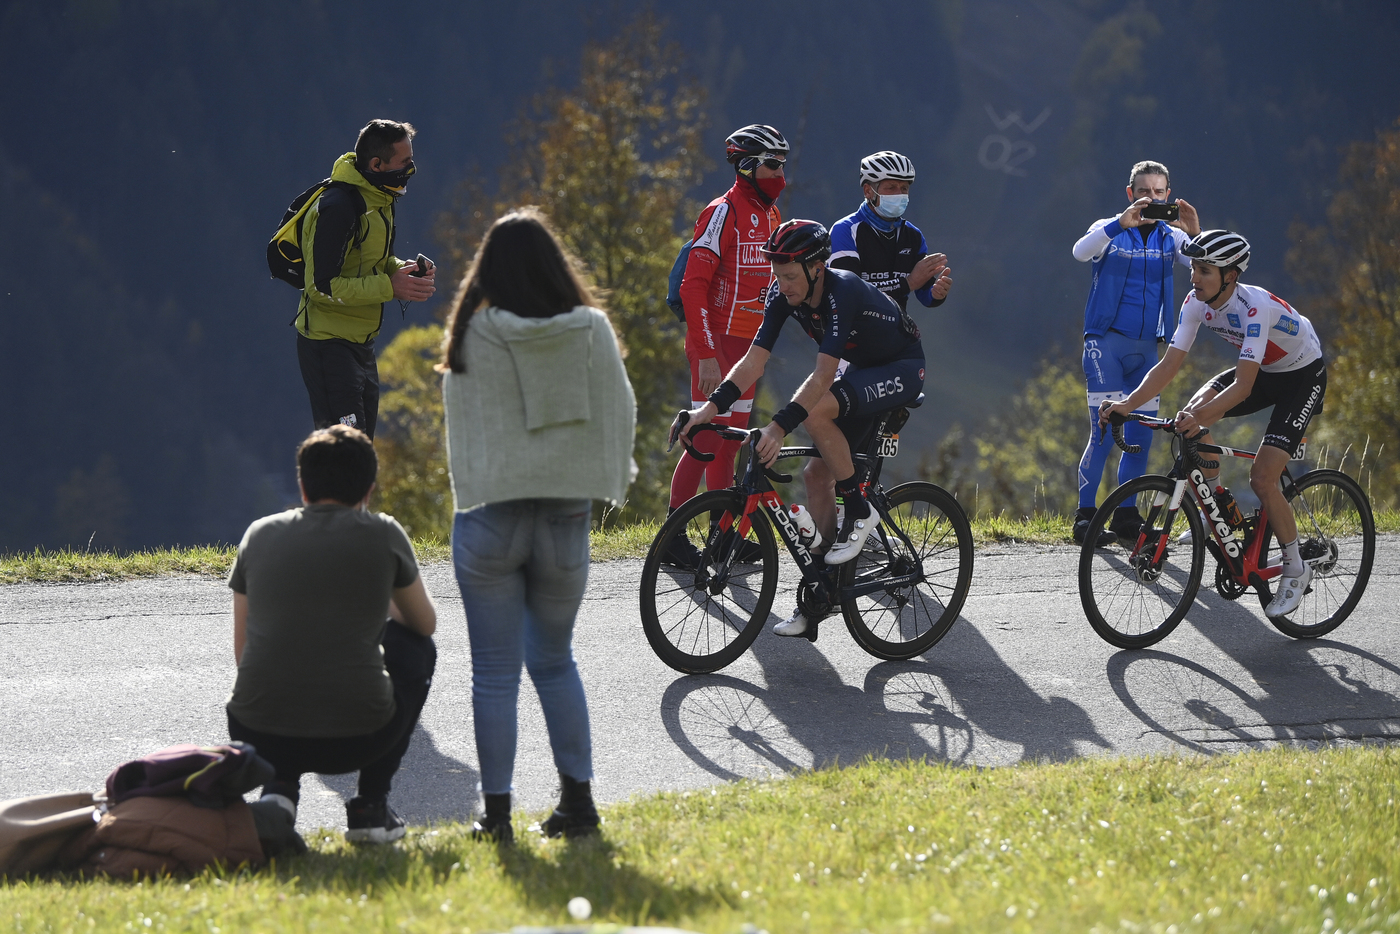 Giro d'Italia 2020: lo Stelvio fa grossi danni. Sunweb in trionfo: vince Hindley, Kelderman in rosa